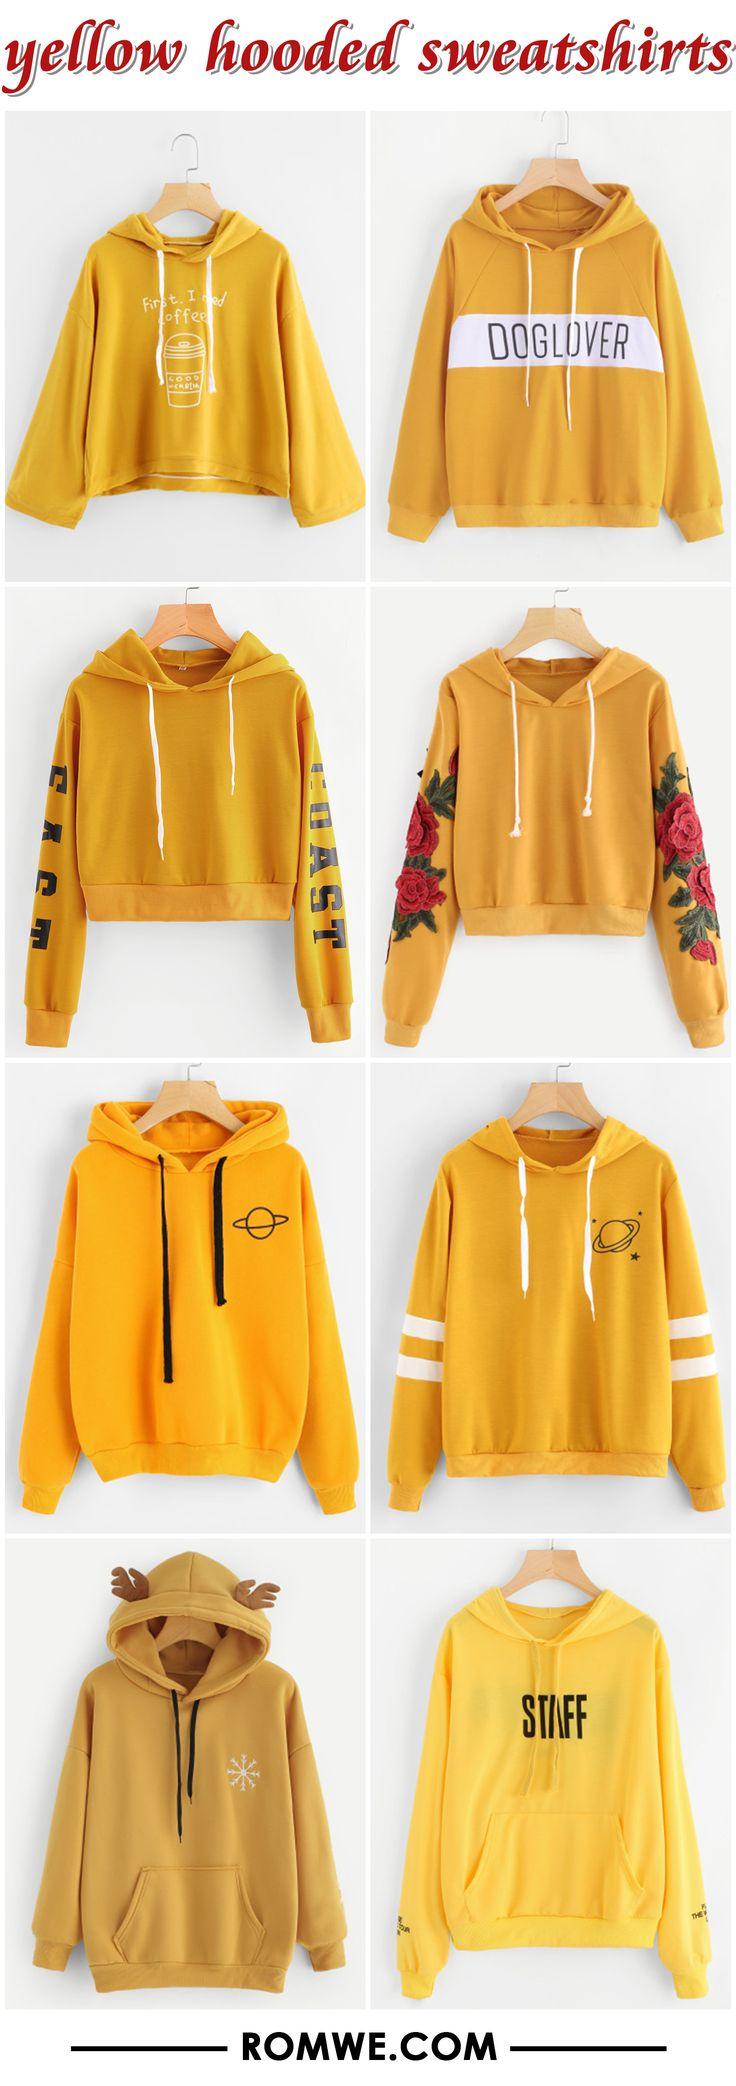 yellow hooded sweatshirts from romwe.com